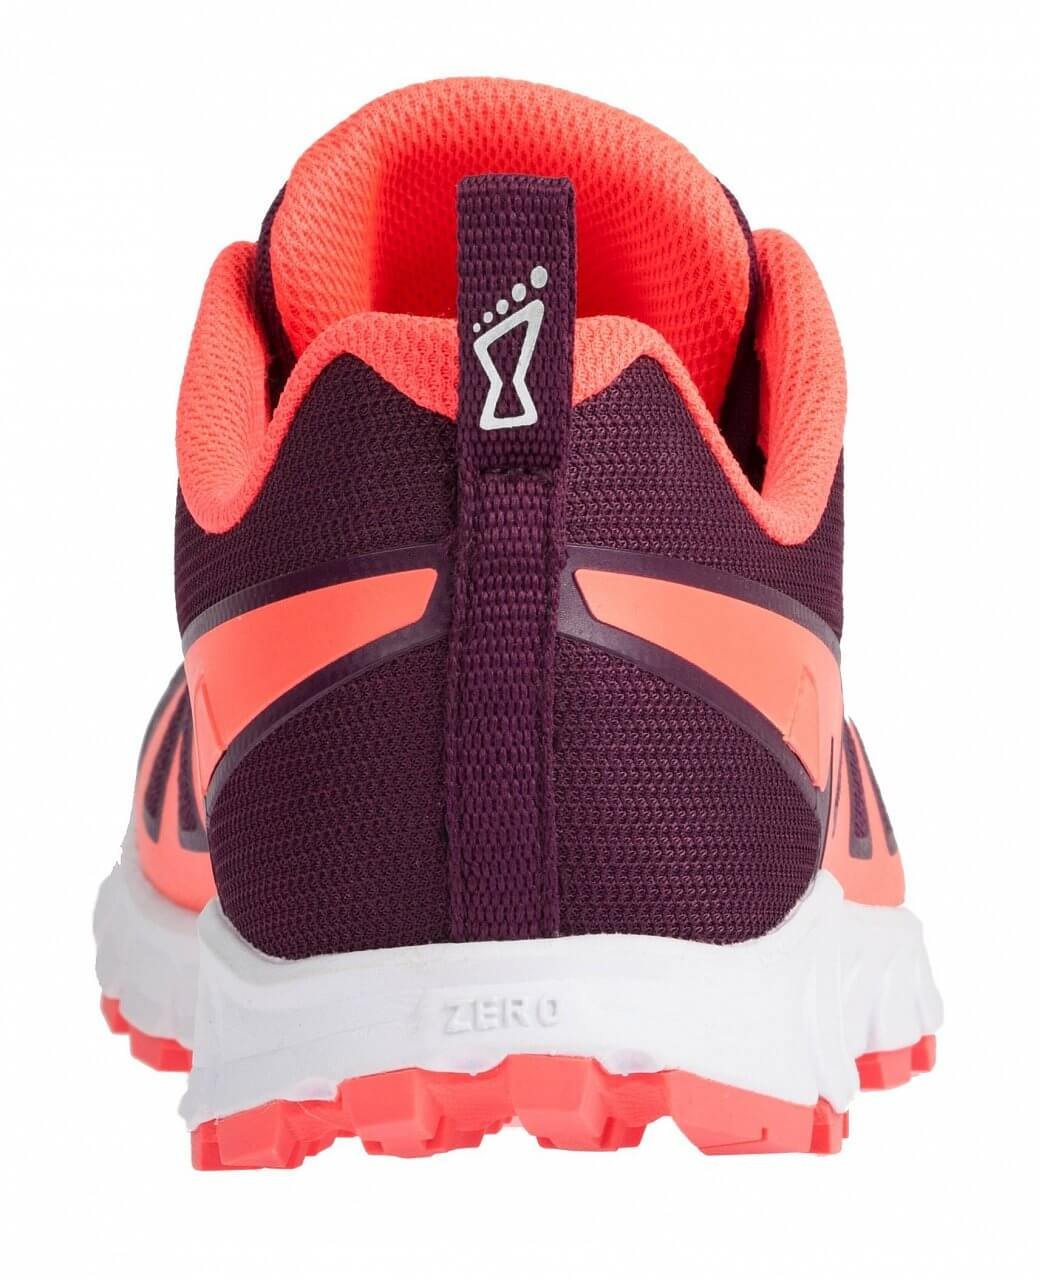 0b3393f38ad Inov-8 Terra Ultra 260 (S) - dámské běžecké boty